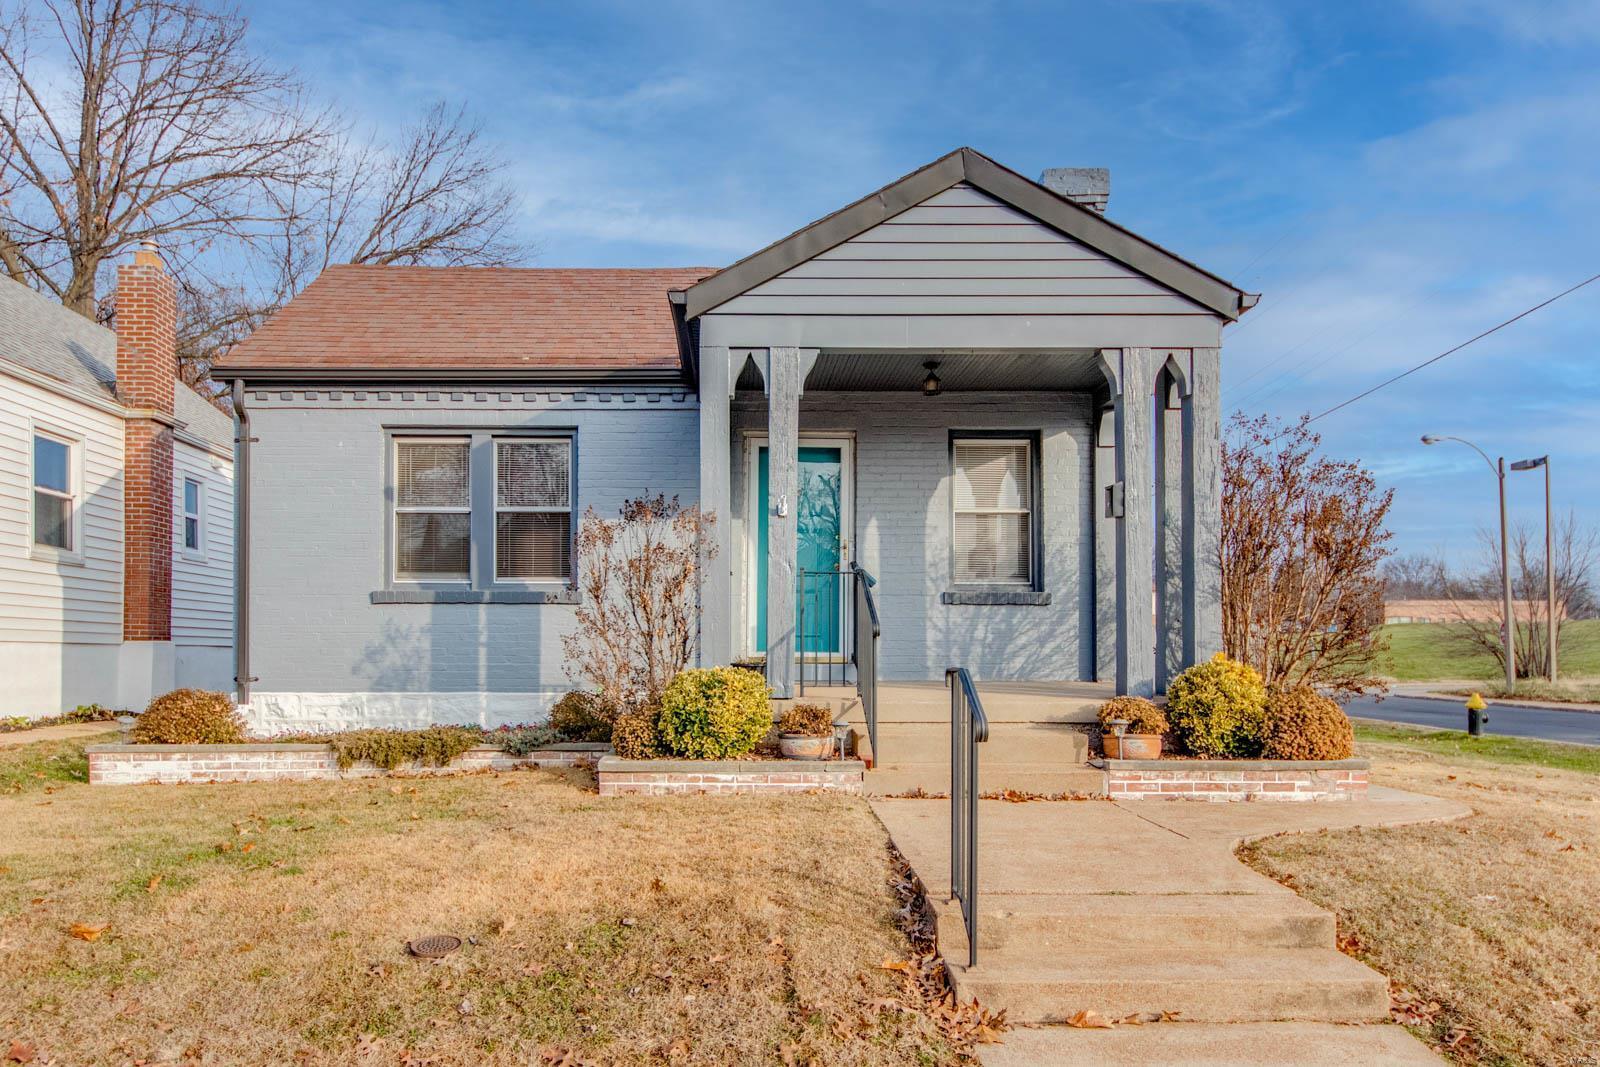 6201 Bradley Property Photo - St Louis, MO real estate listing